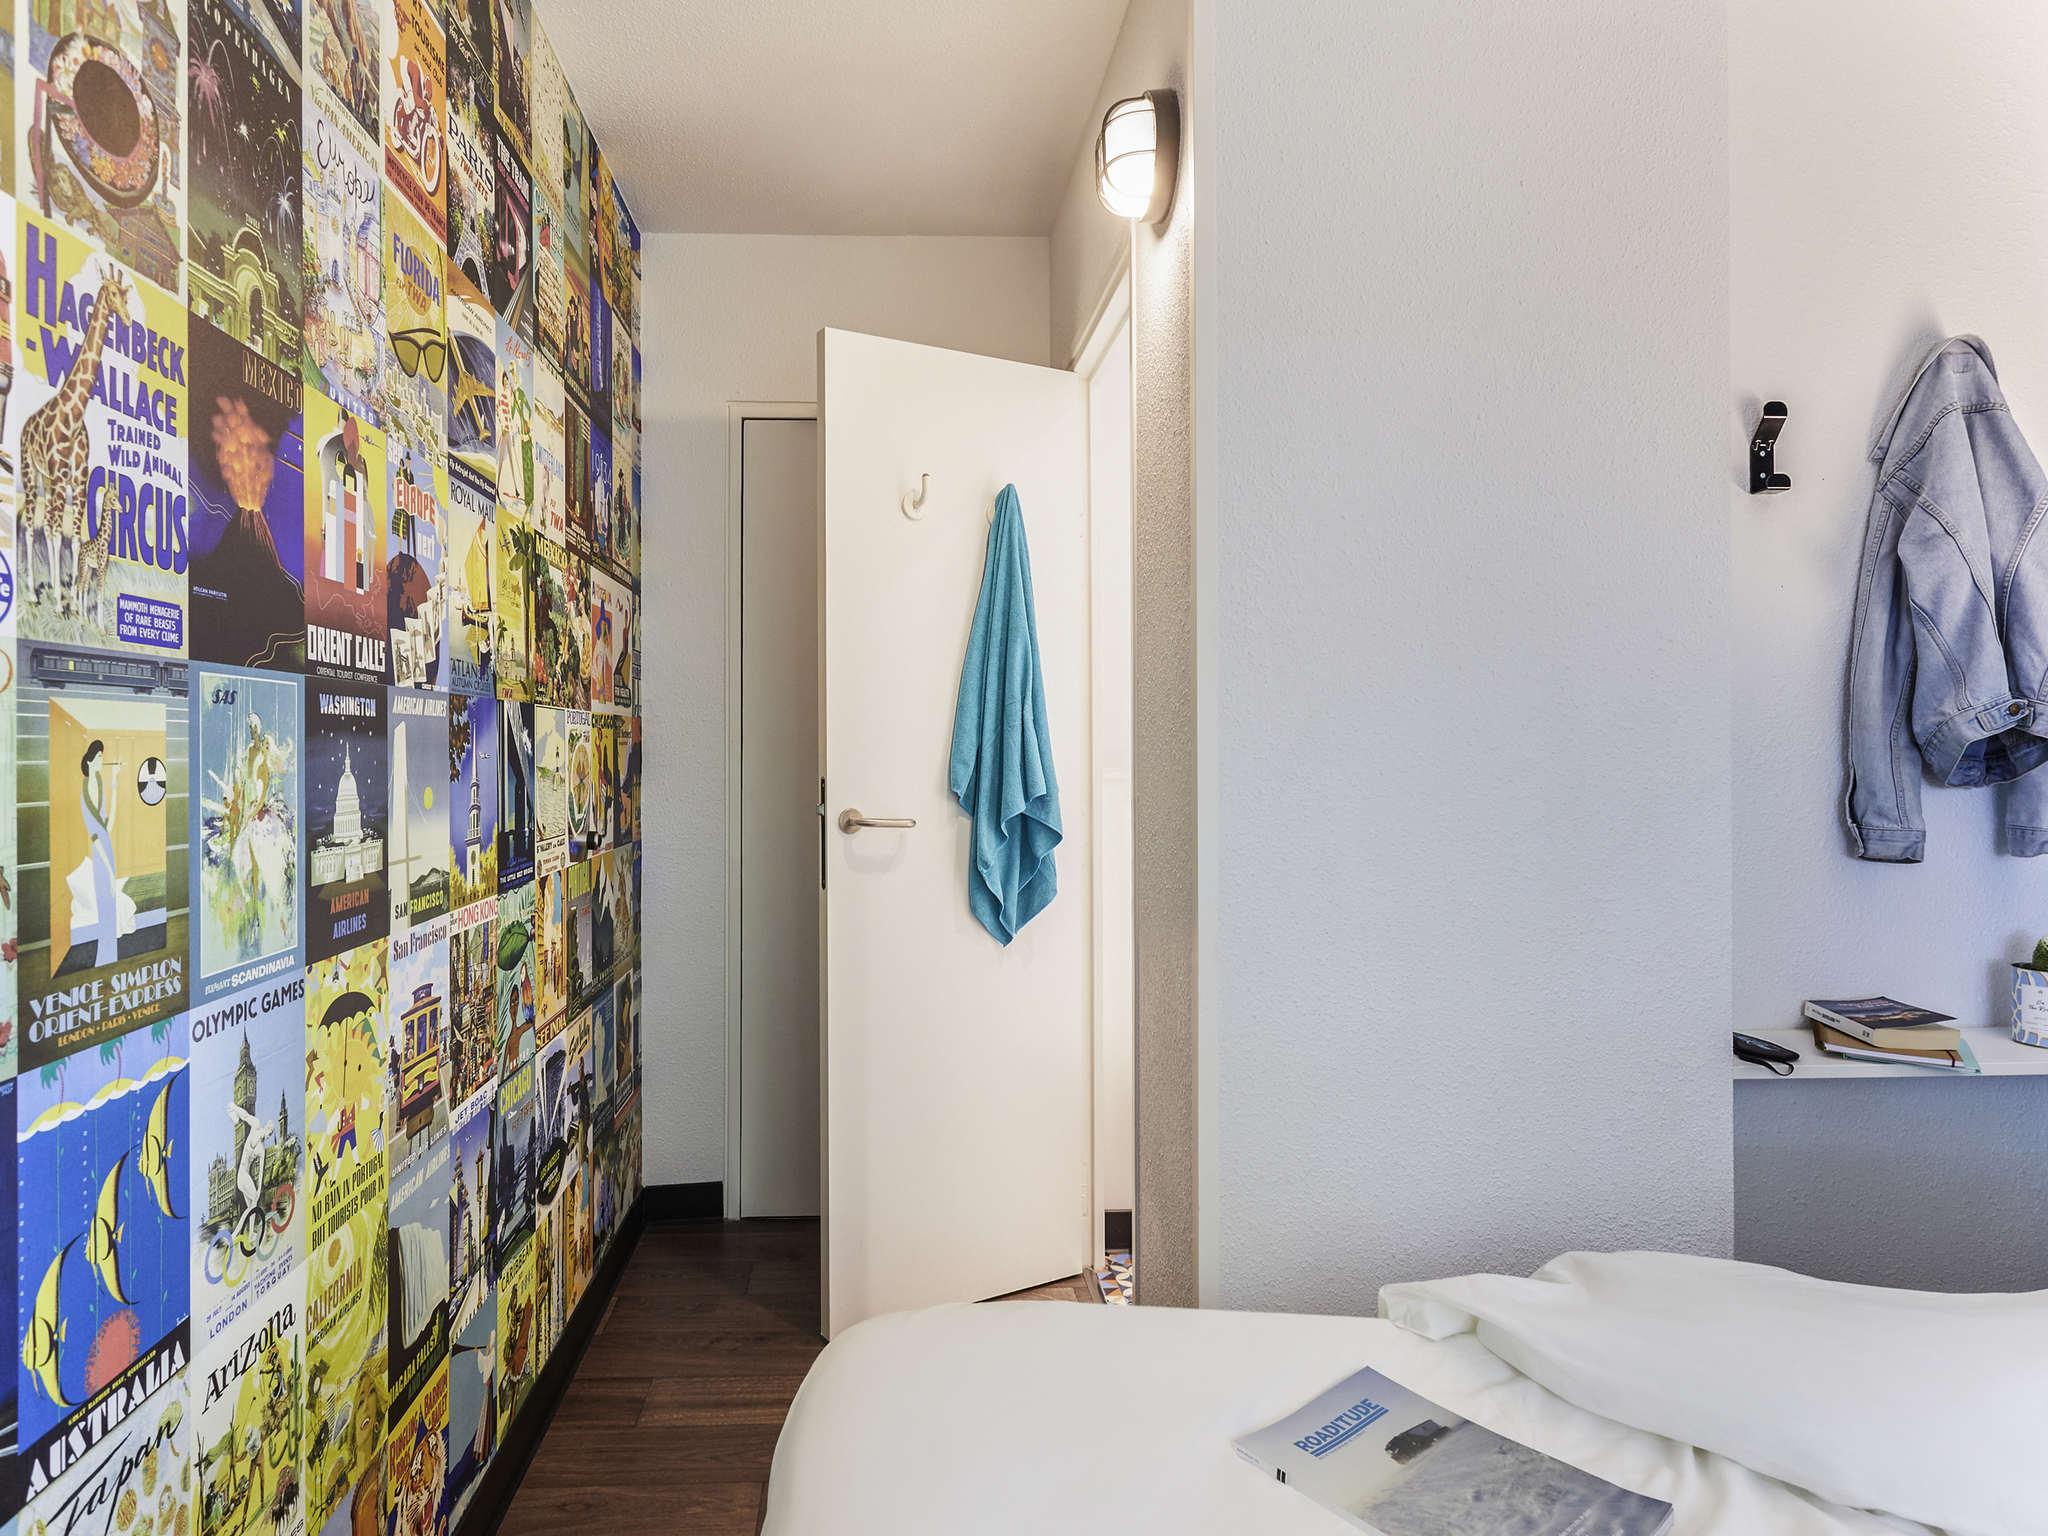 Hotel in CLERMONT FERRAND - hotelF1 Clermont Ferrand Est on